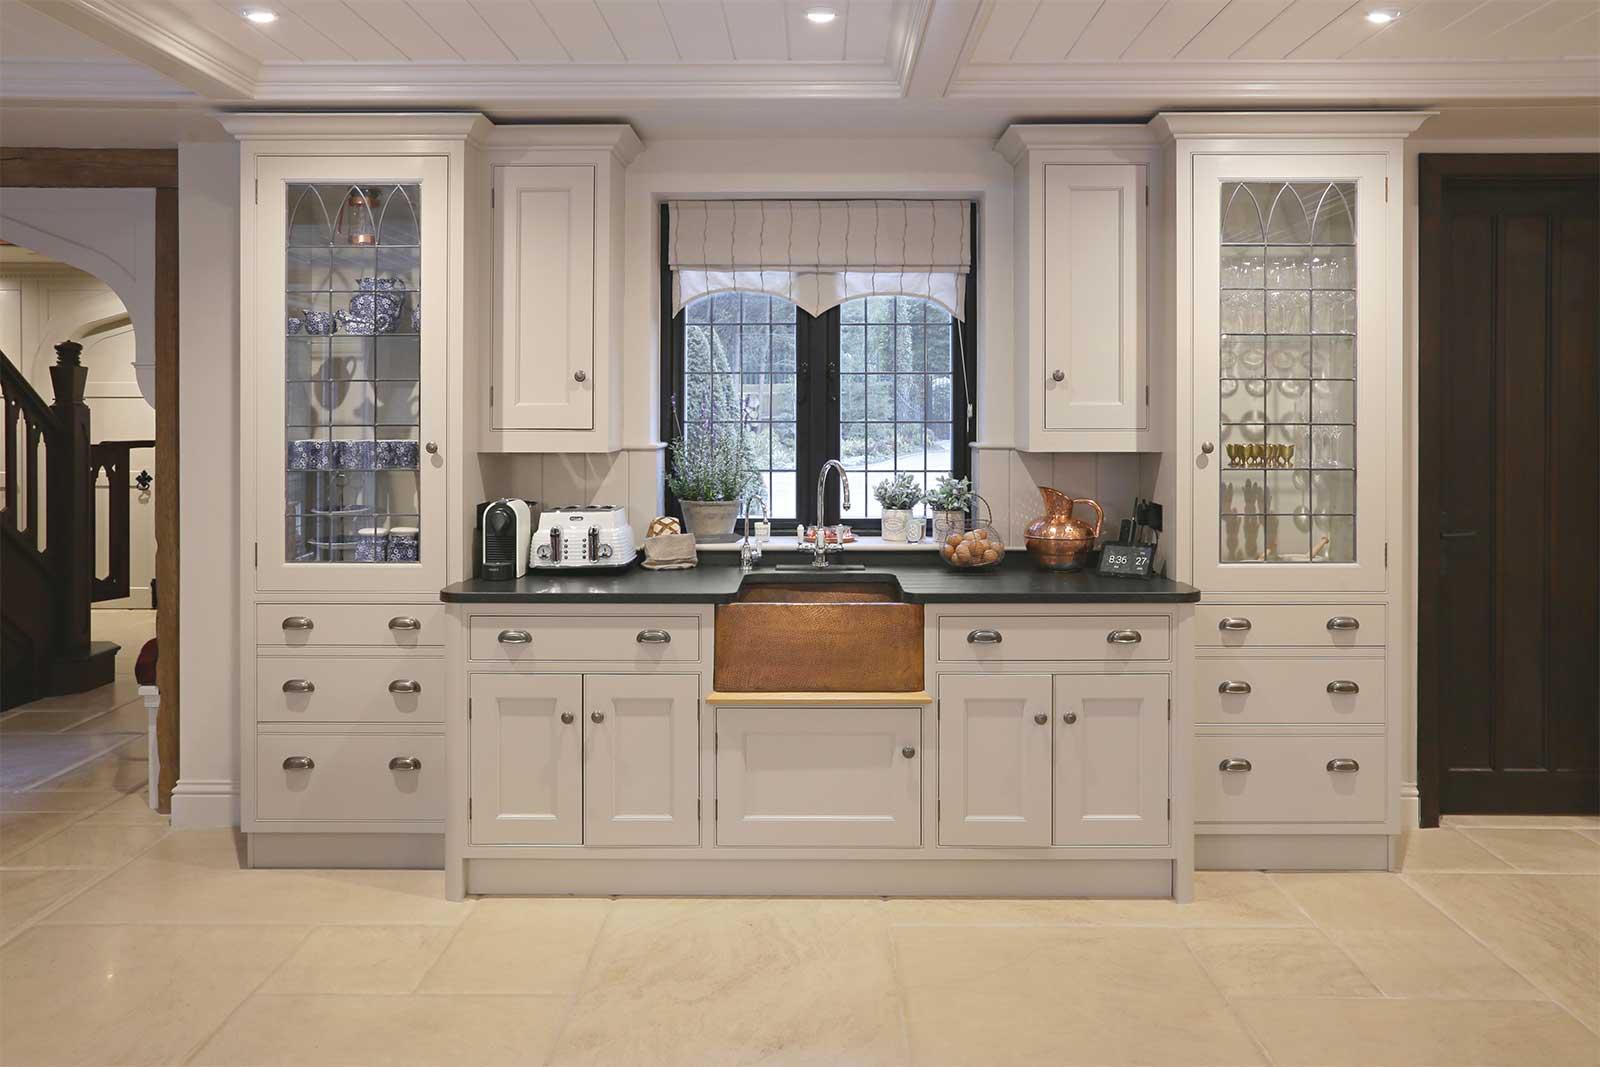 Crème Tumbled Limestone floor tiles